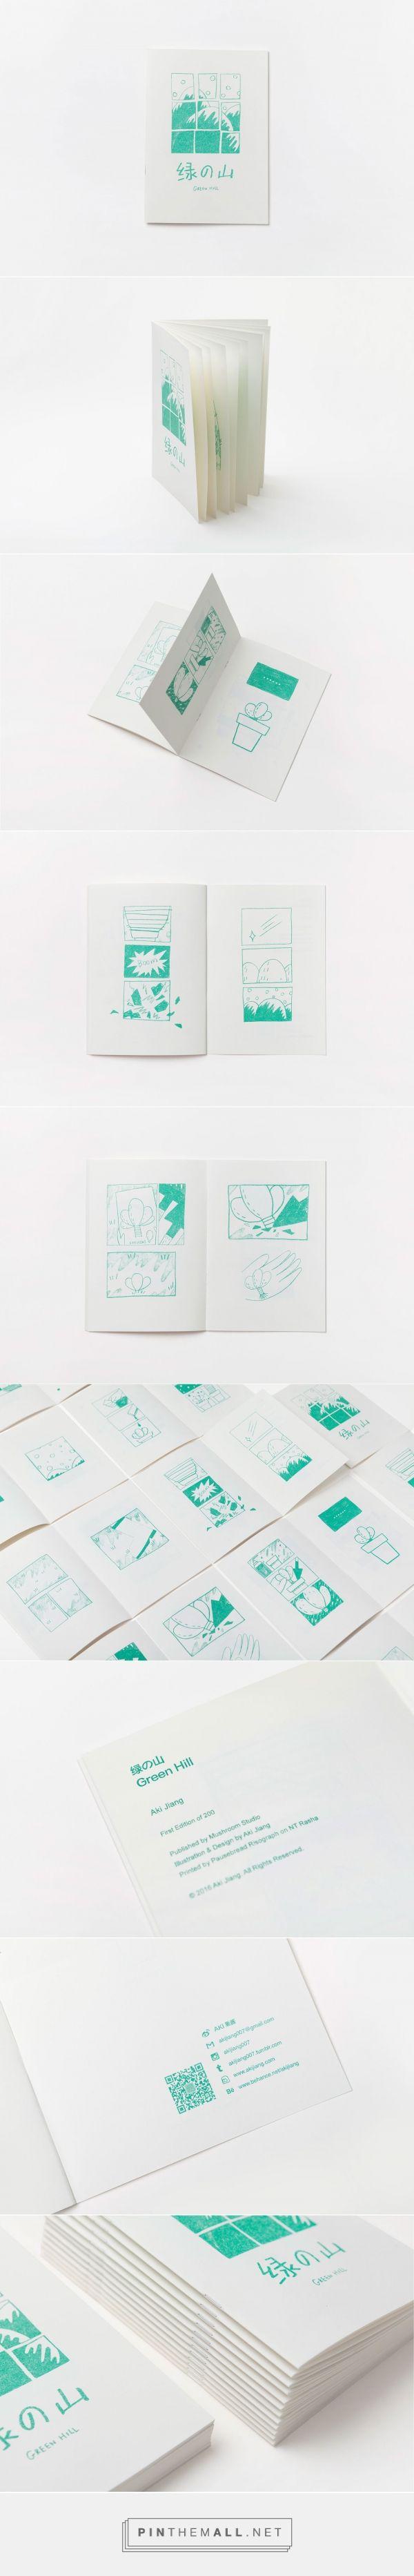 Self-Publishing Zine-Green Hill /自出版Zine《绿の山》 on Behance - created via…